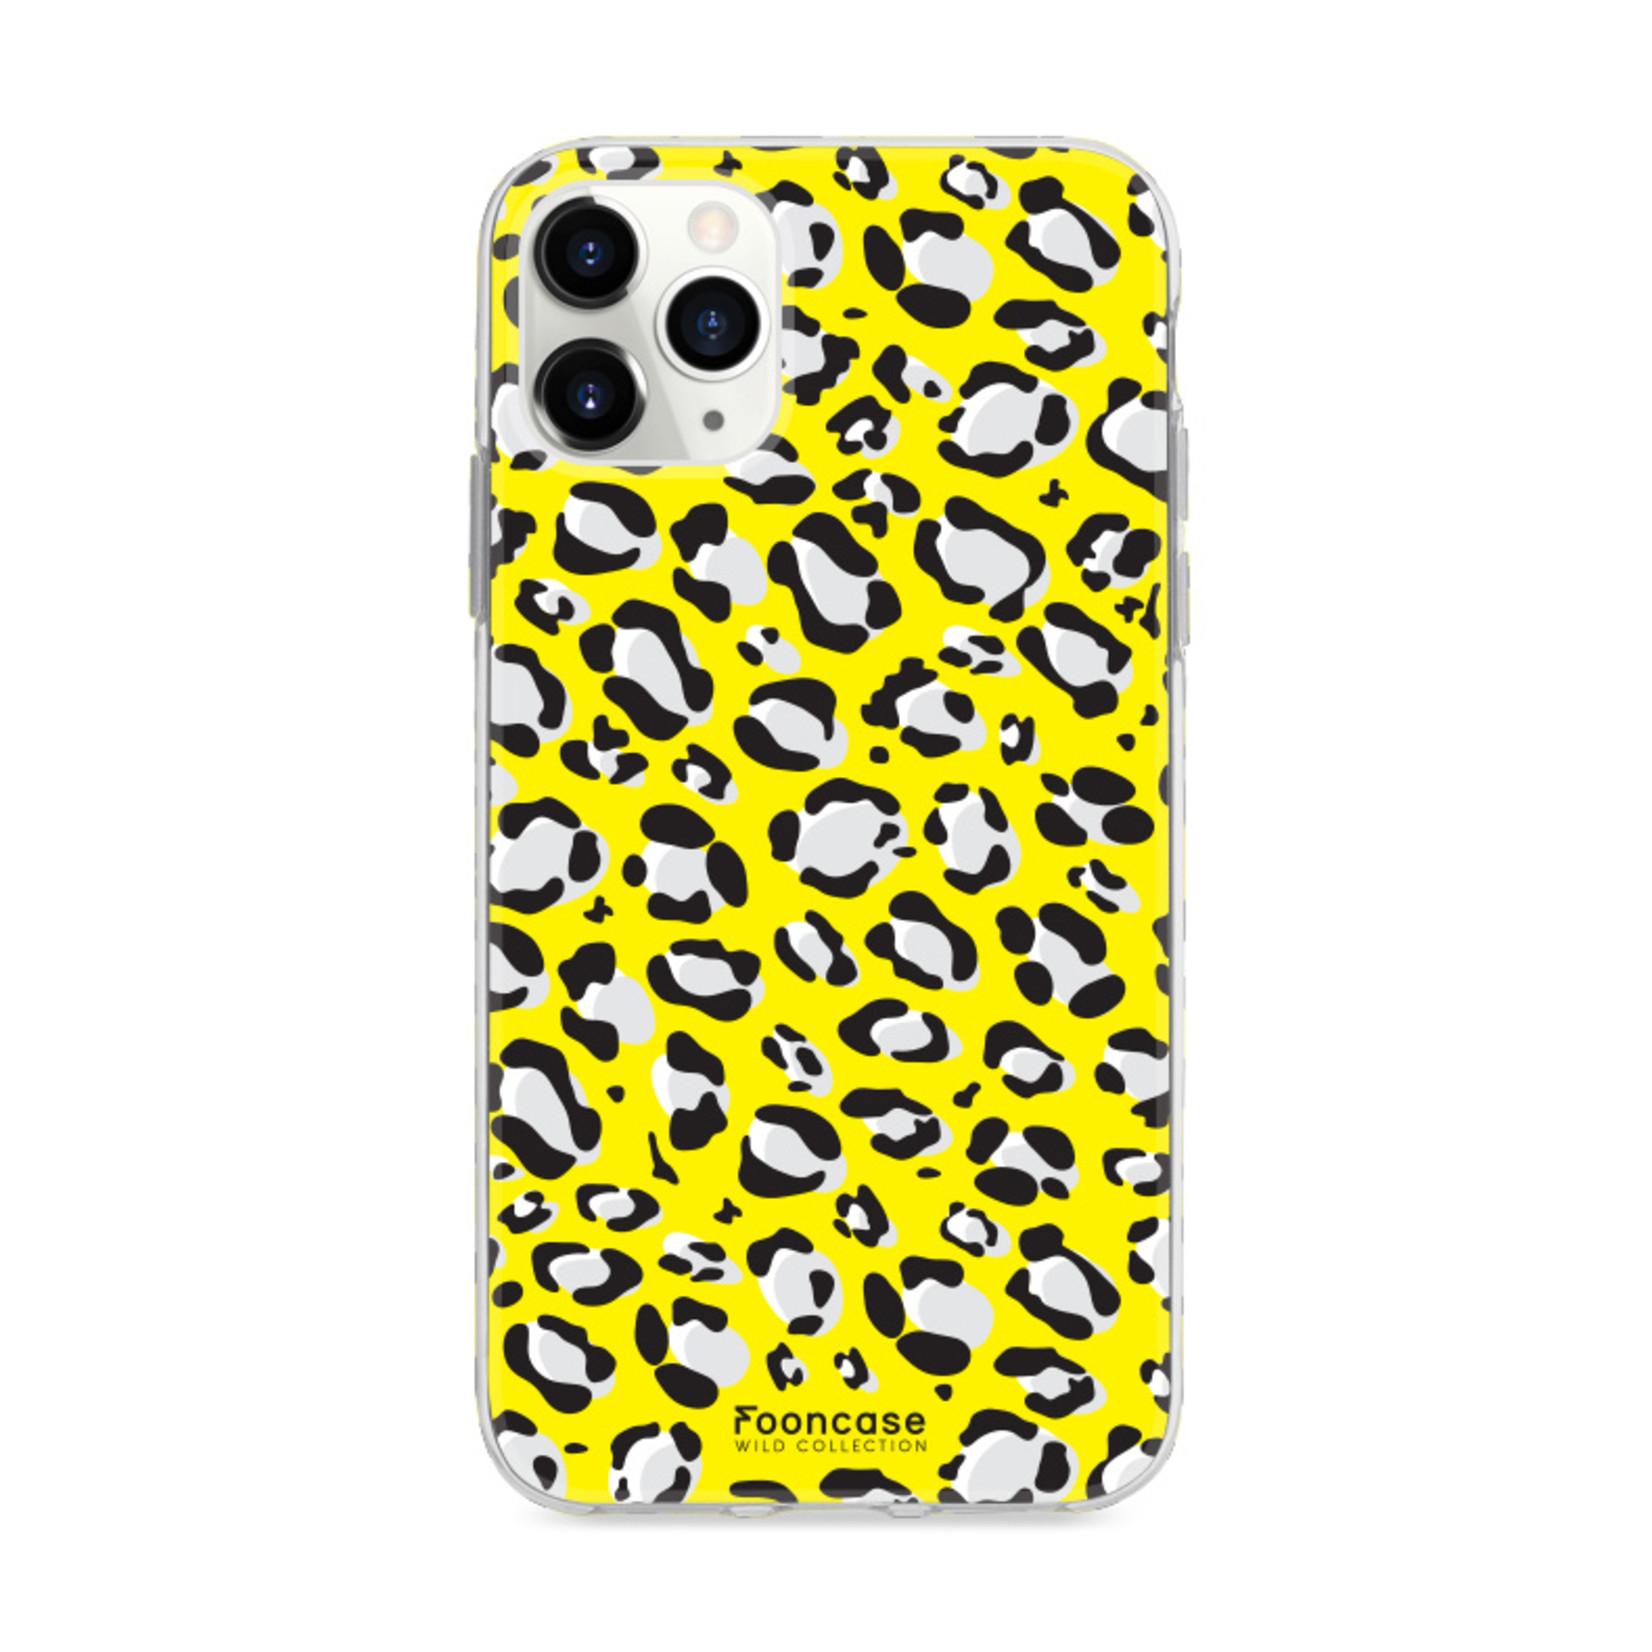 FOONCASE IPhone 11 Pro Max- WILD COLLECTION / Gelb